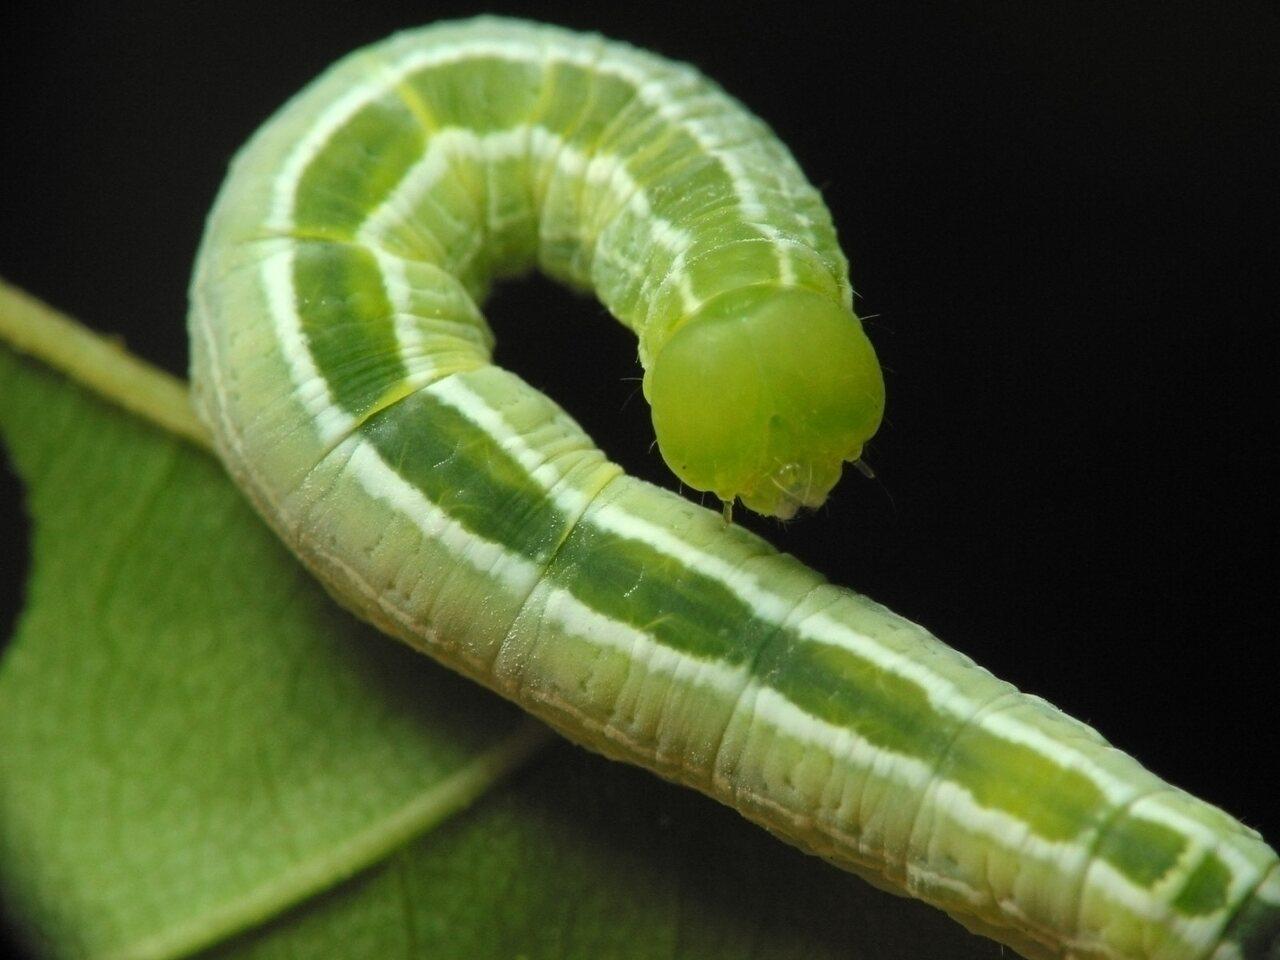 Lepidoptera-1433.jpg